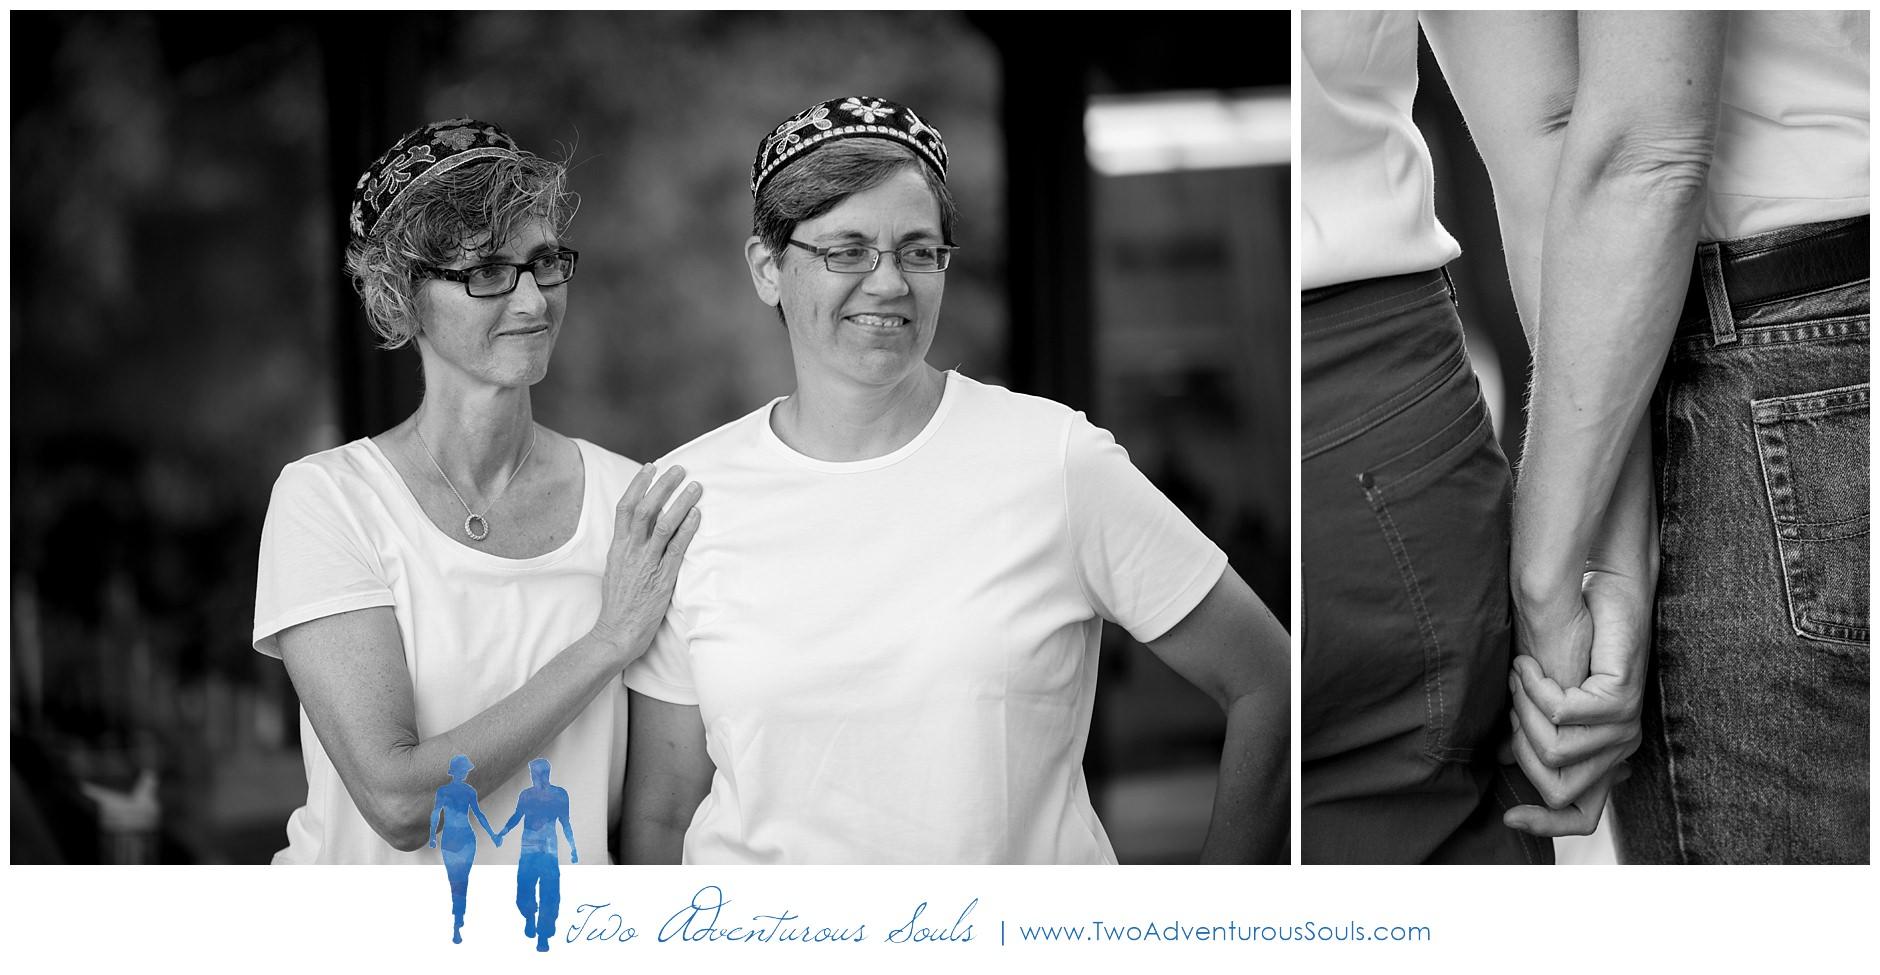 090217-Mindy-Karen-sneaks-48_WEB-Maine-Wedding-and-Portrait-Photographer.jpg